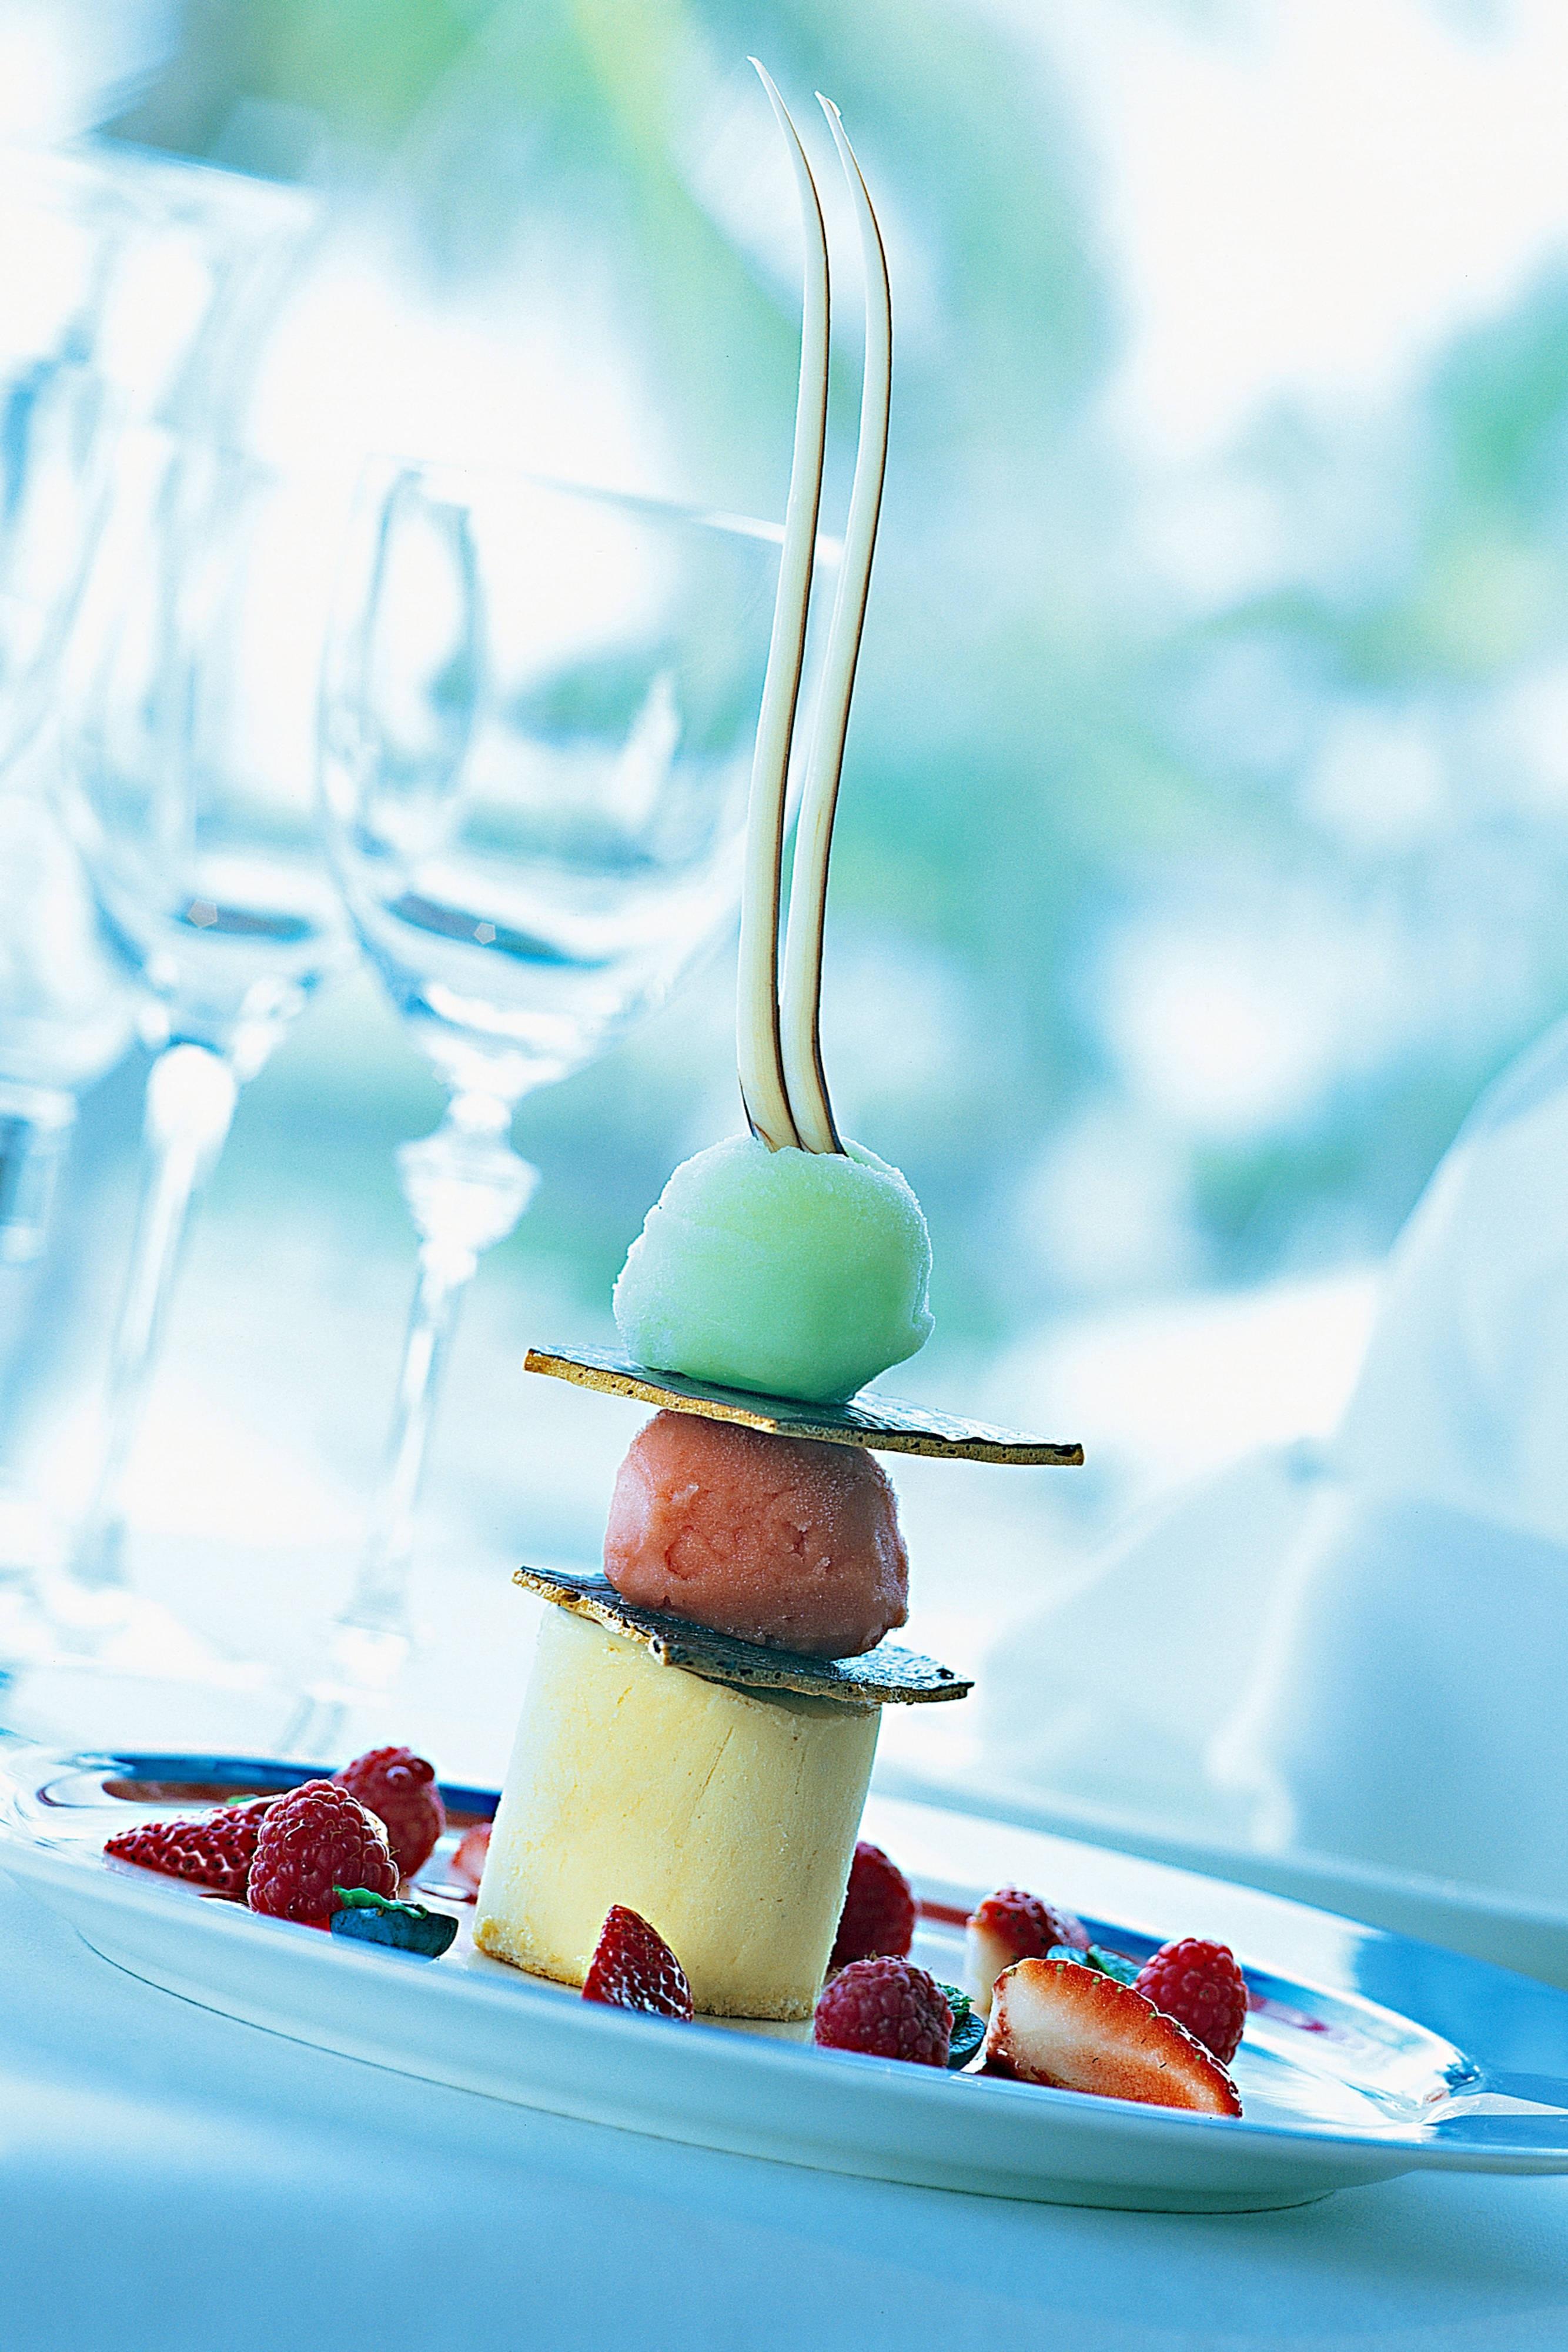 Food & Beverage dessert